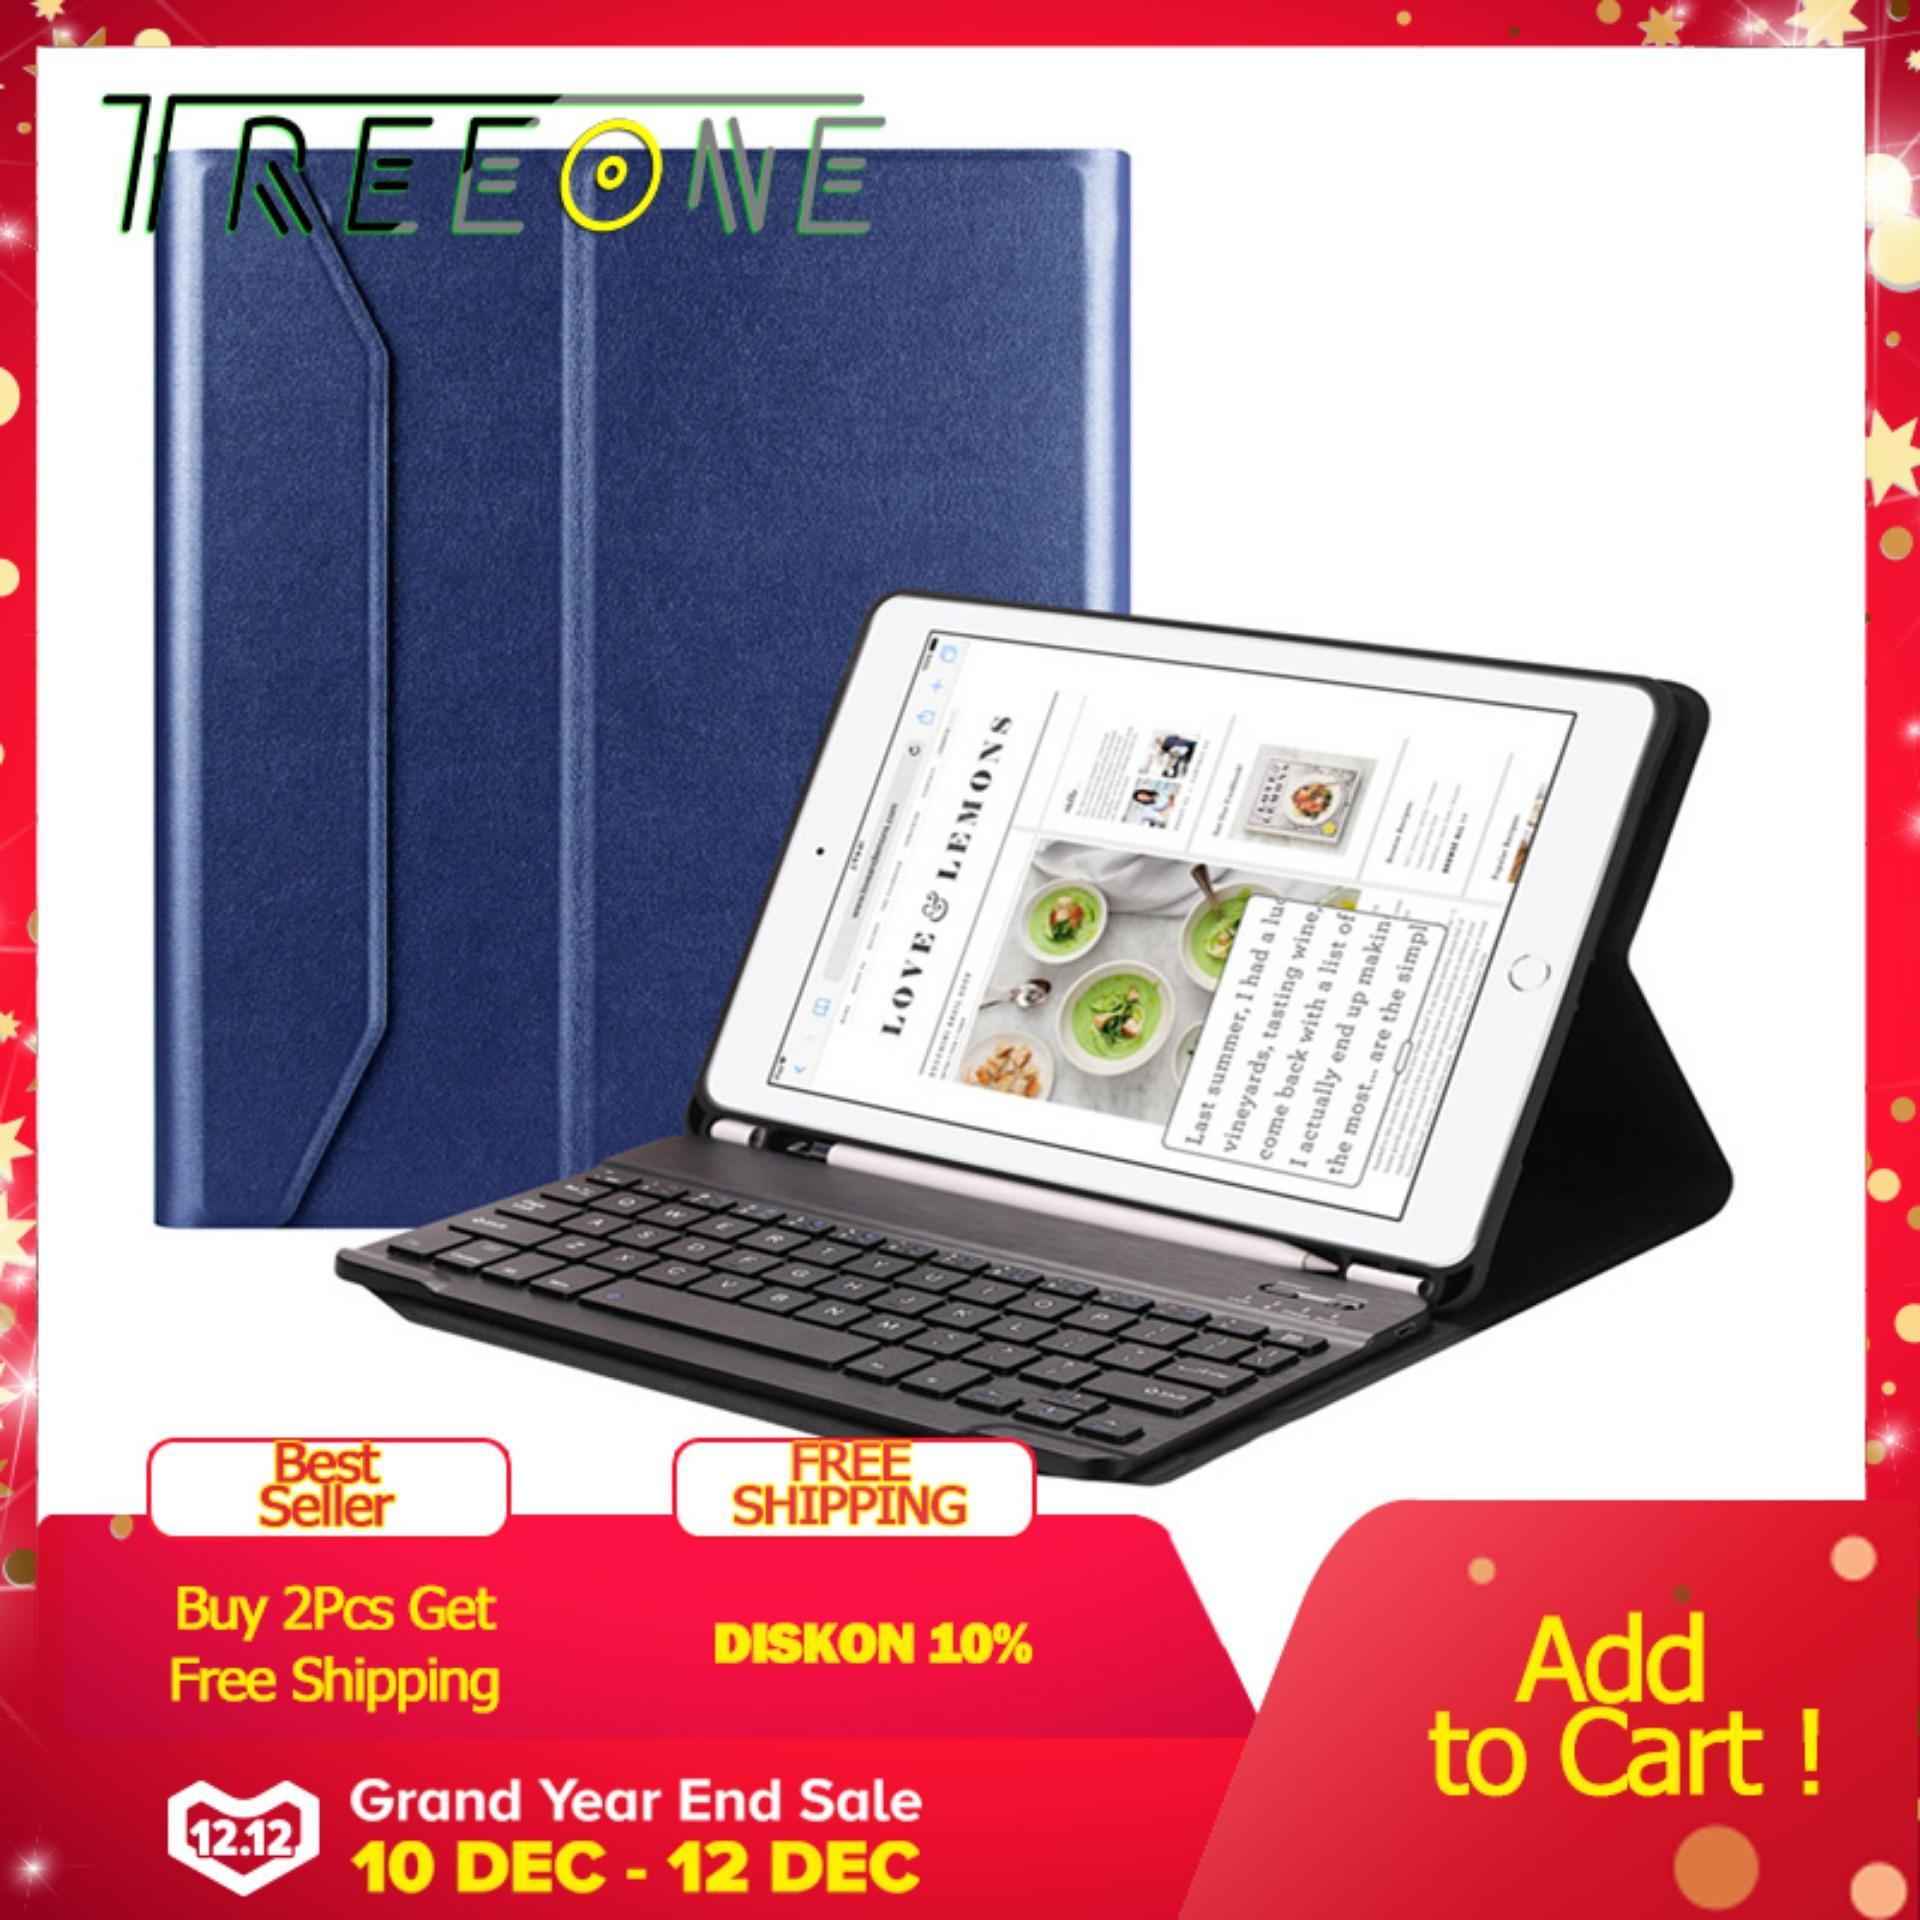 [FREE SHIPPING]Treeone IPad 9.7/iPad Air Keyboard Case,Ultra-Slim